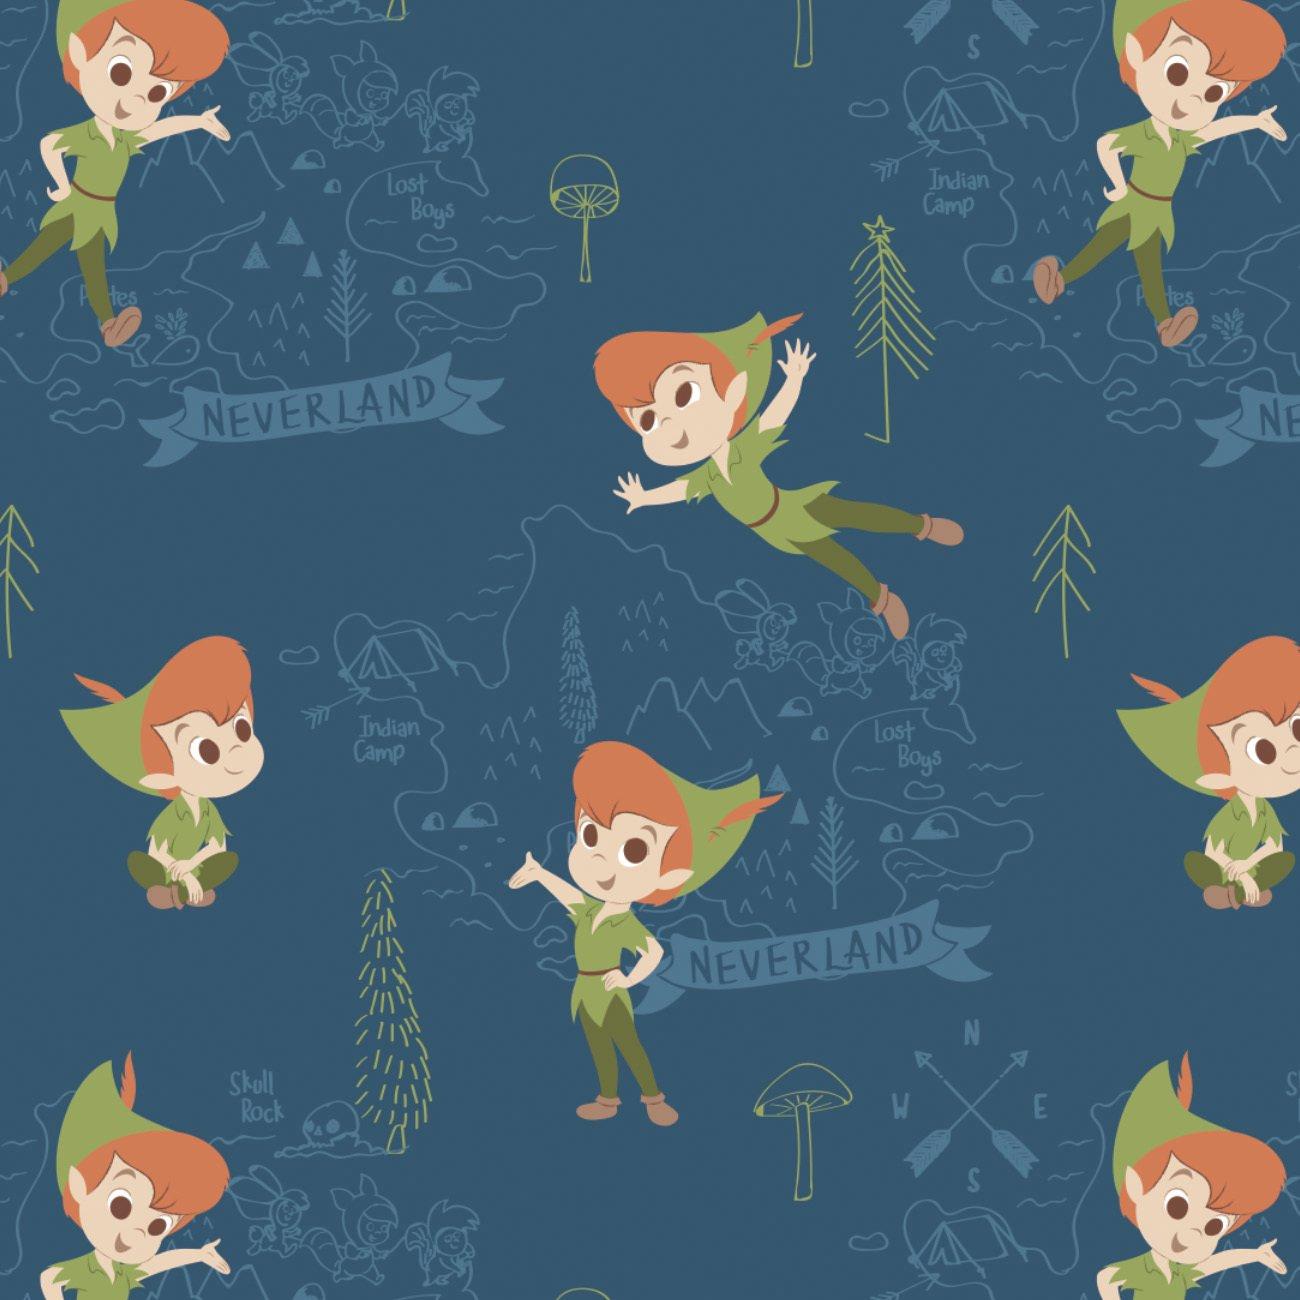 CF-Peter Pan & Tinkerbell 85330201B-03 Blue - Neverland Adventures Flannel